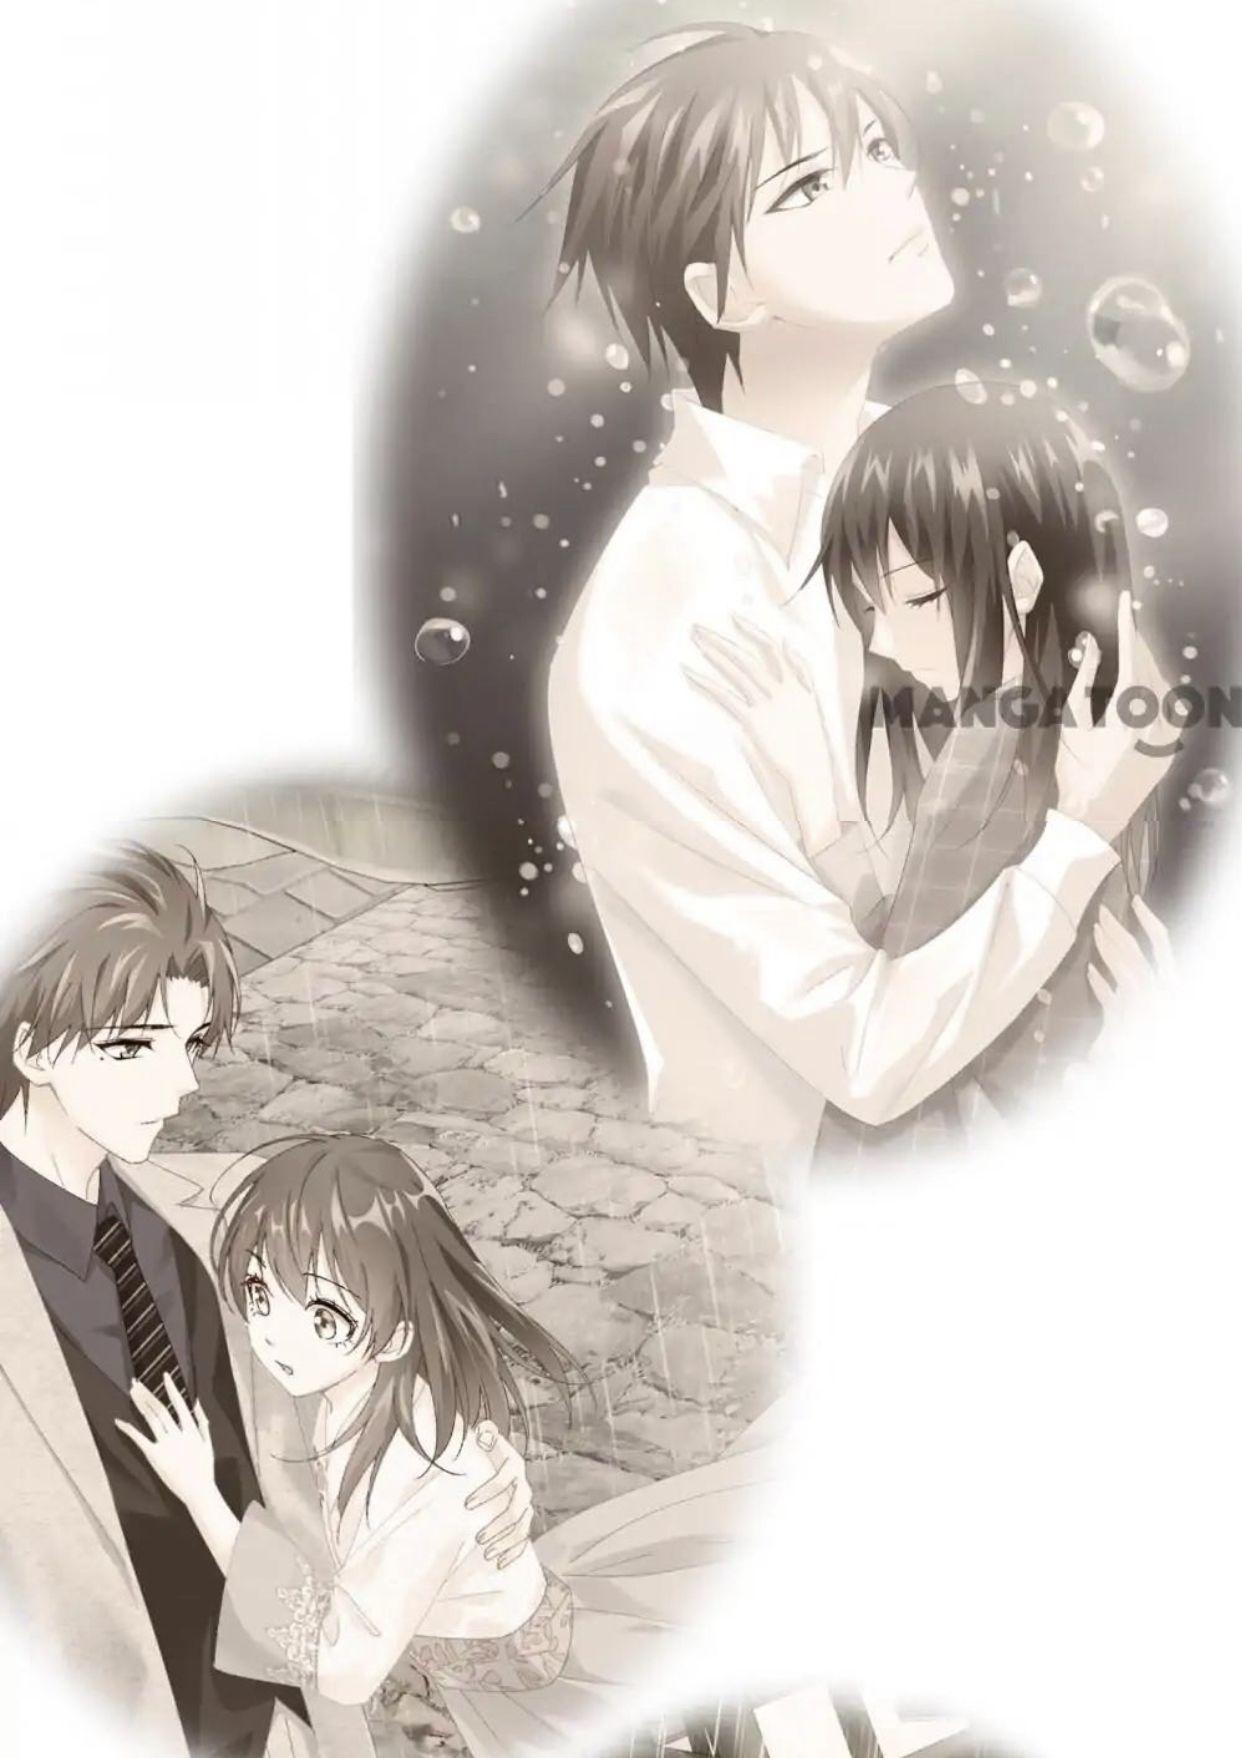 Pin by Animemangaluver on Stream Flow Into Dream Webtoon